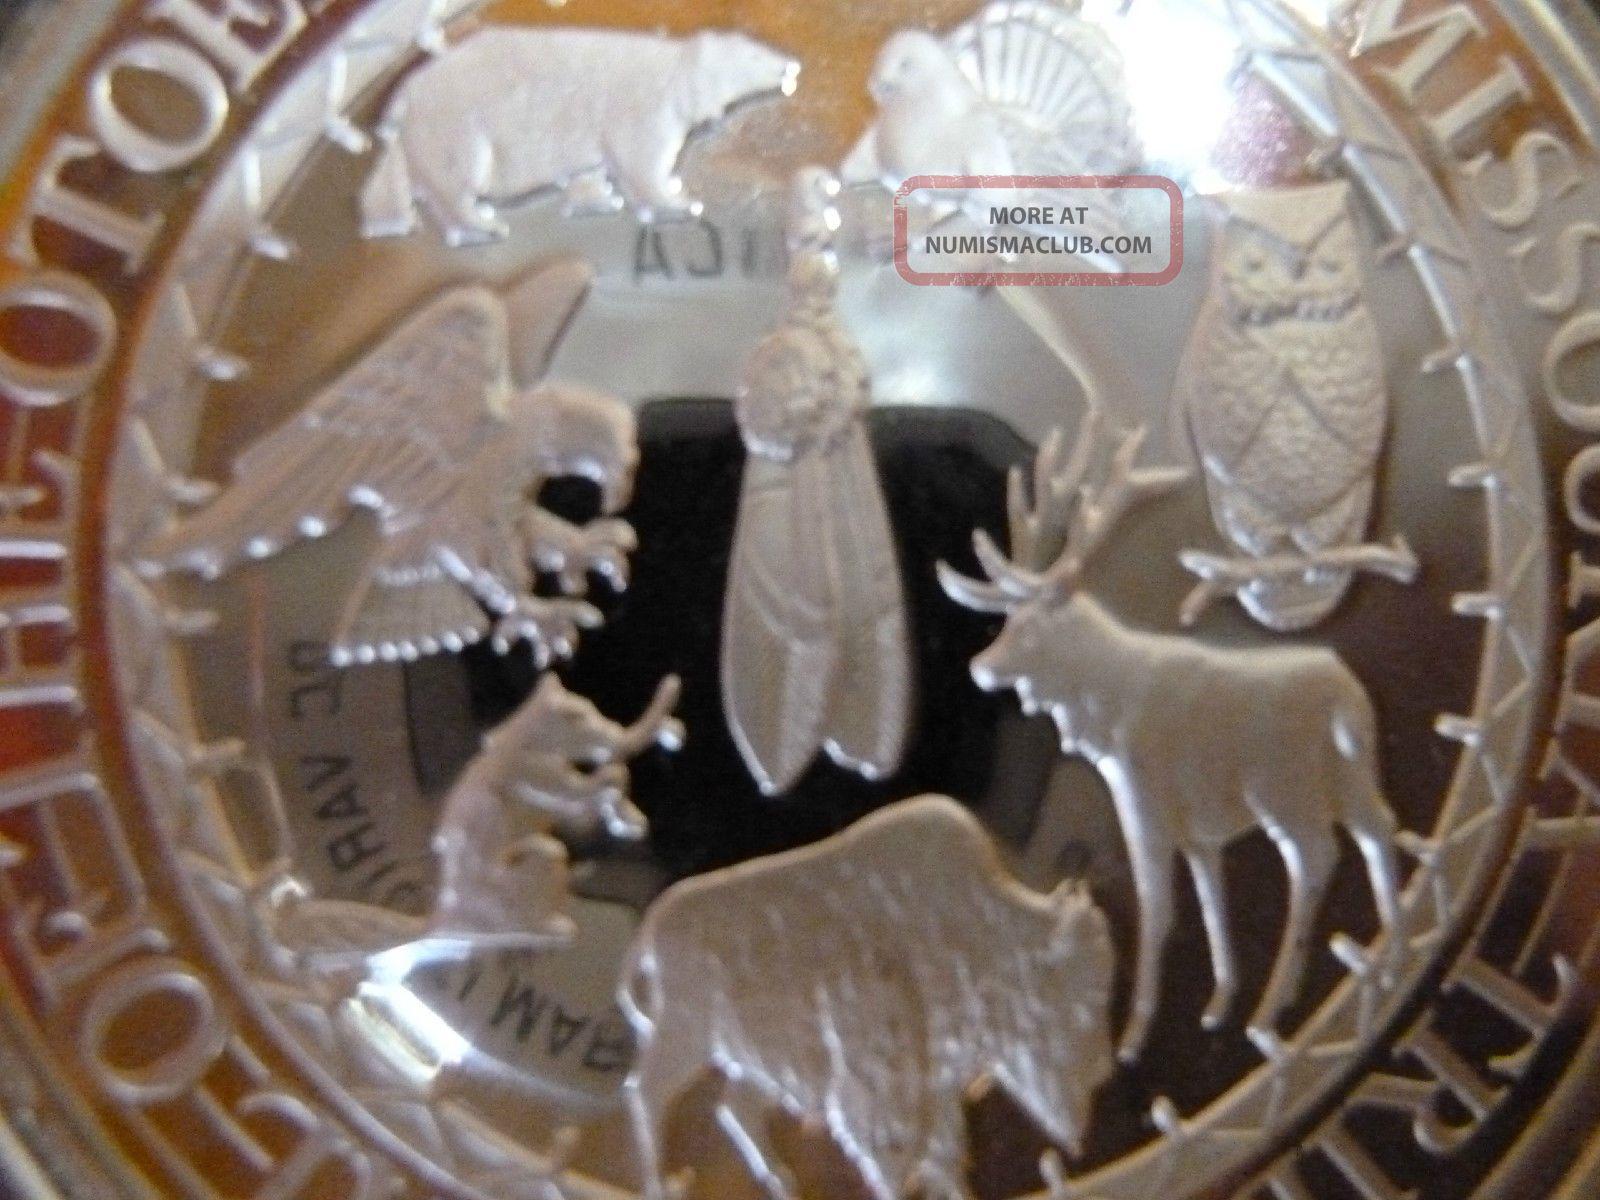 Sovereign Nation Otoe Missouria1976 Indian Tribe 999